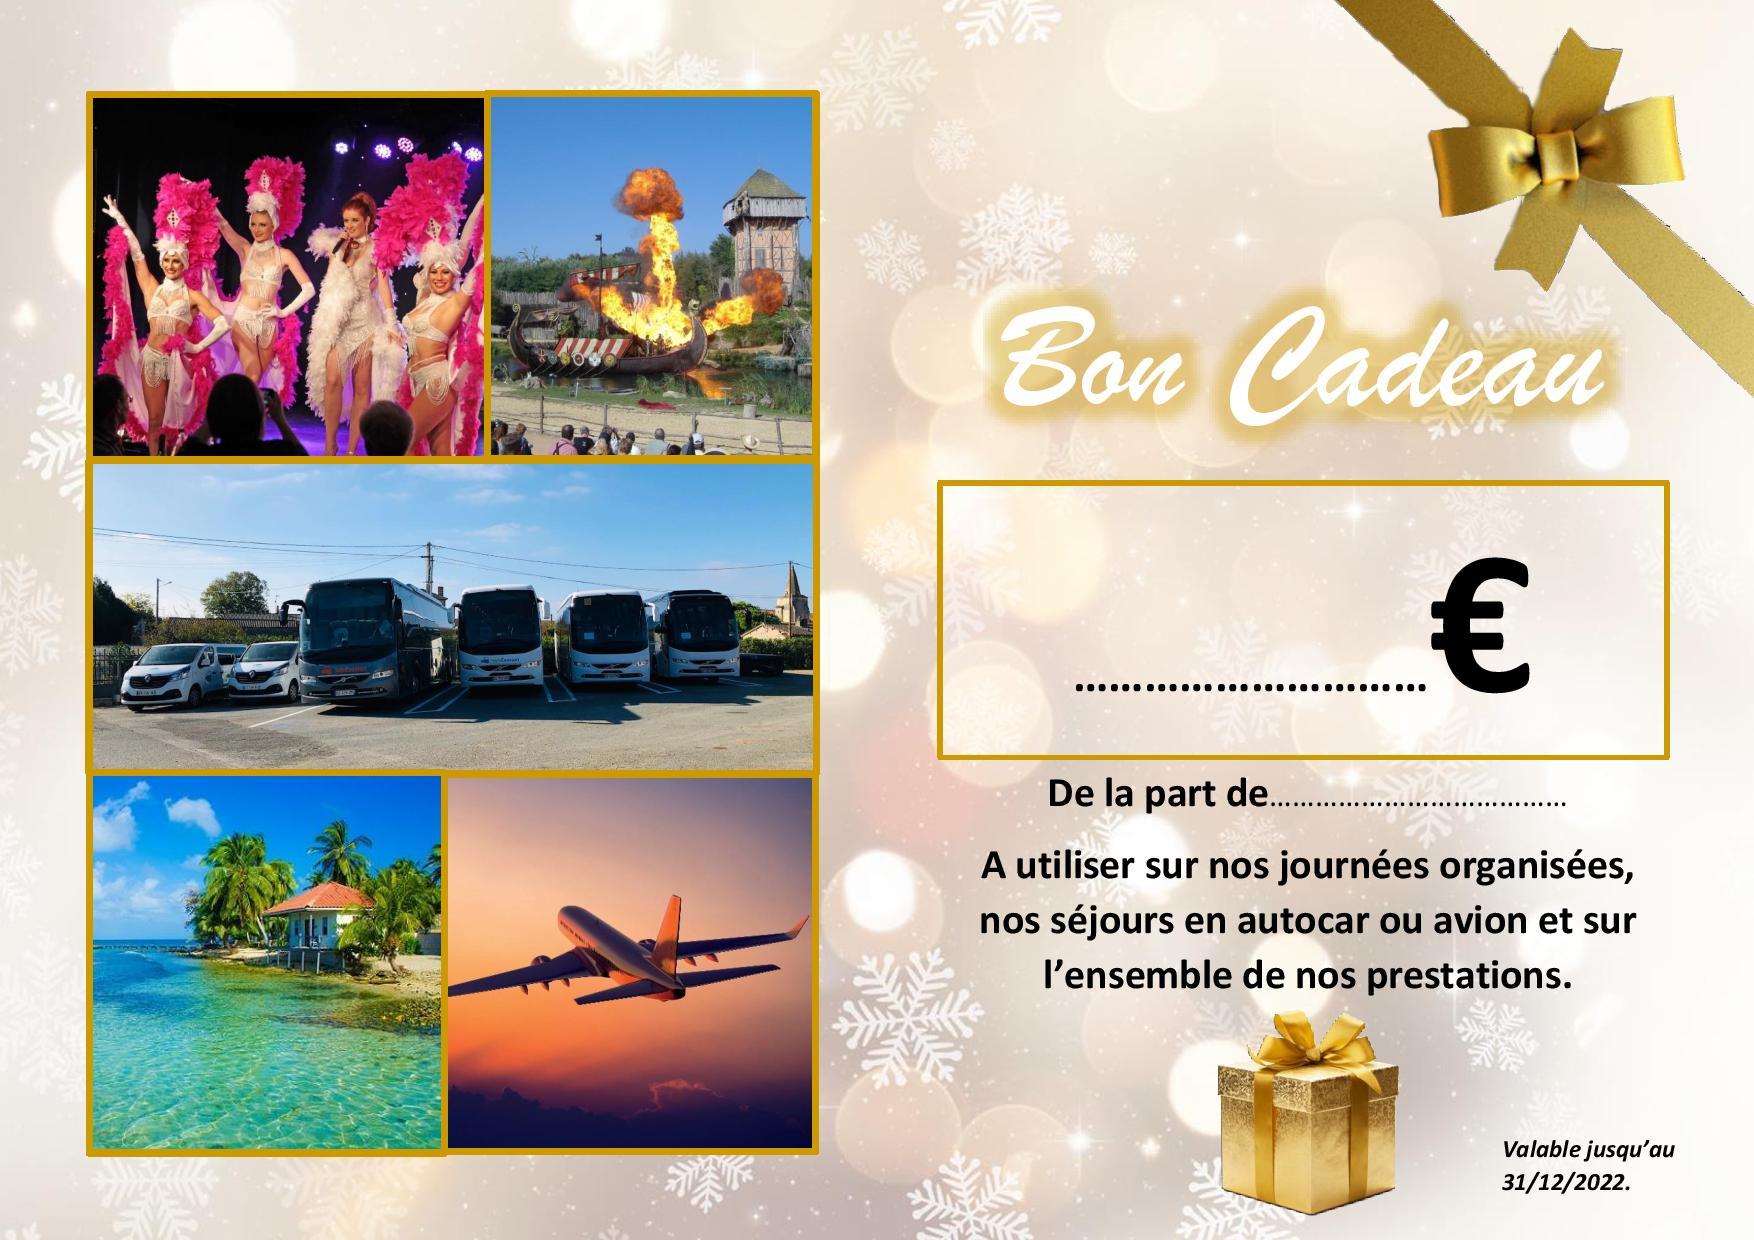 Bon cadeau = 100 €